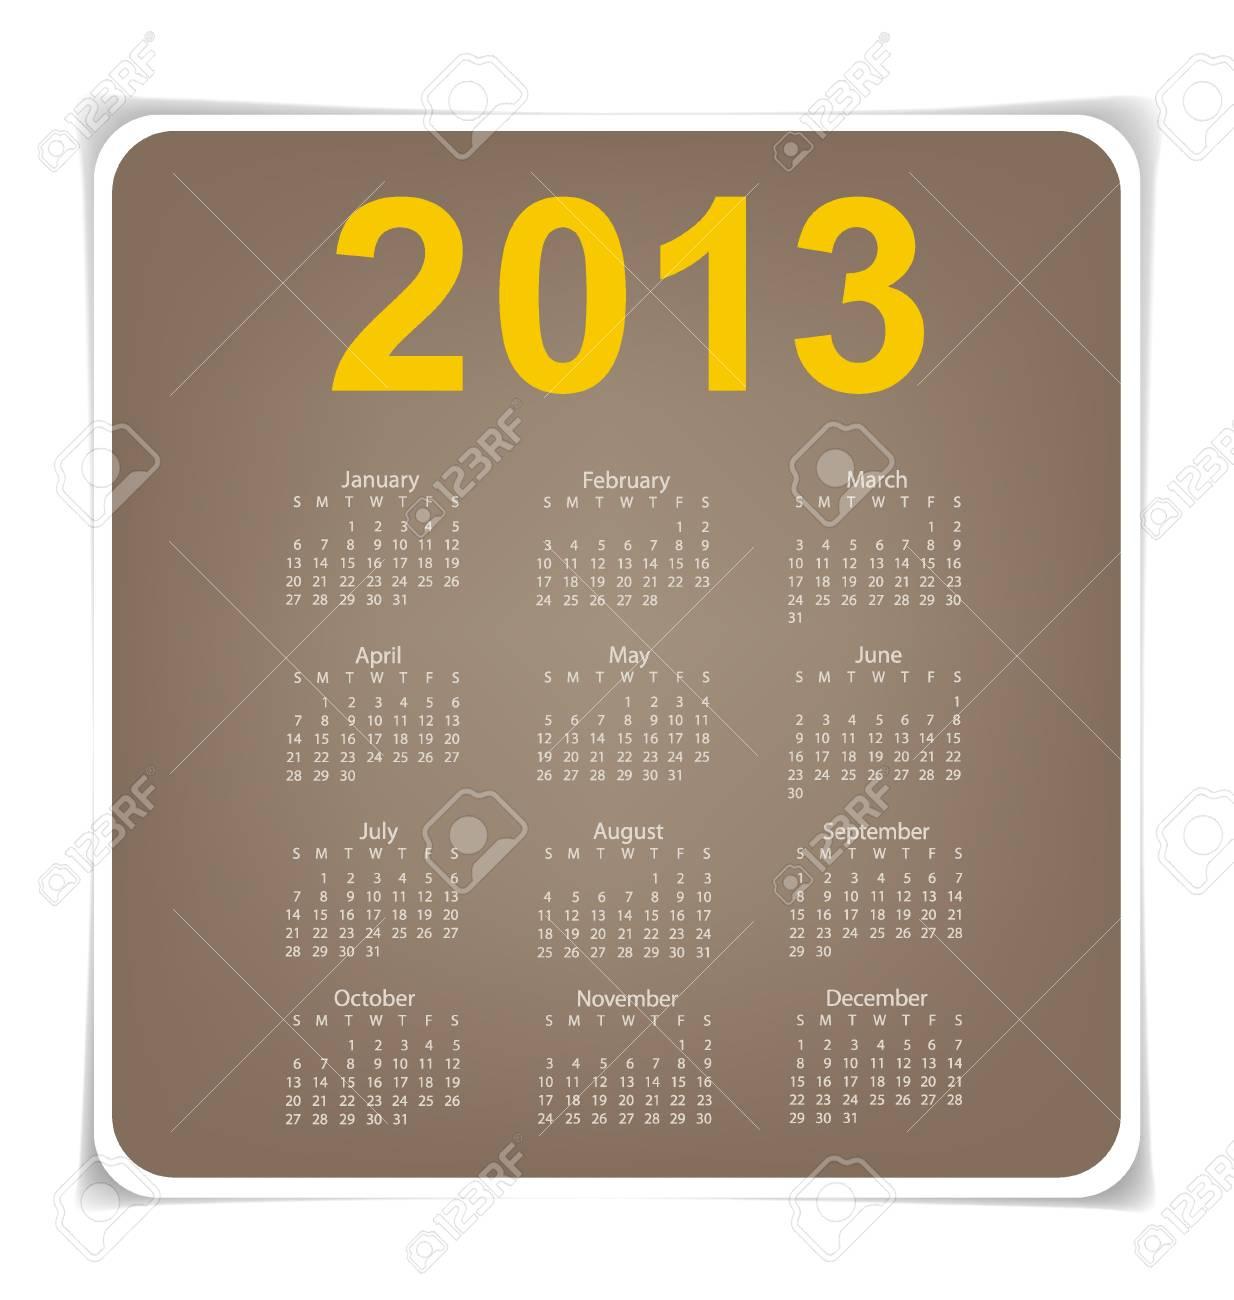 Simple 2013 year calendar Stock Vector - 17101743